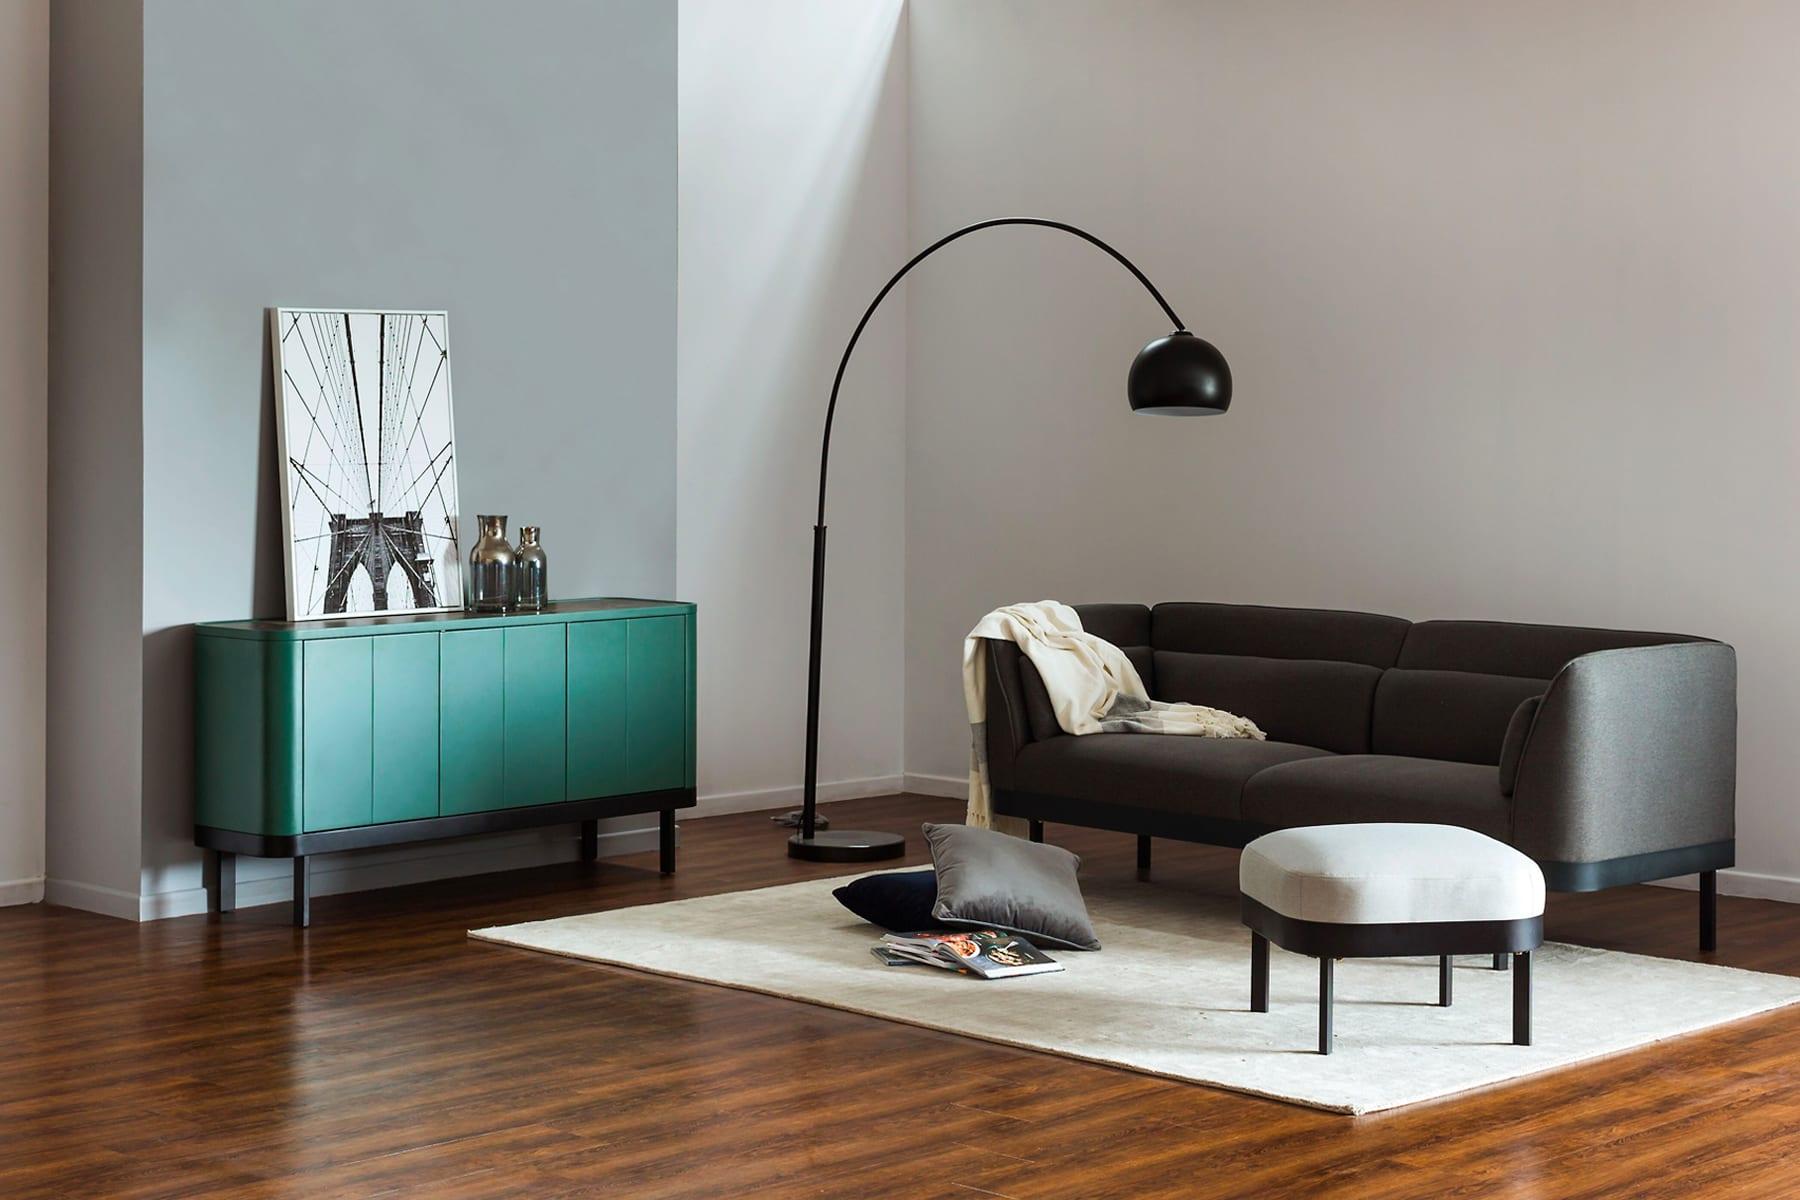 designer living room with sofa, ottoman and sideboard designed by polish designer krystian kowalski